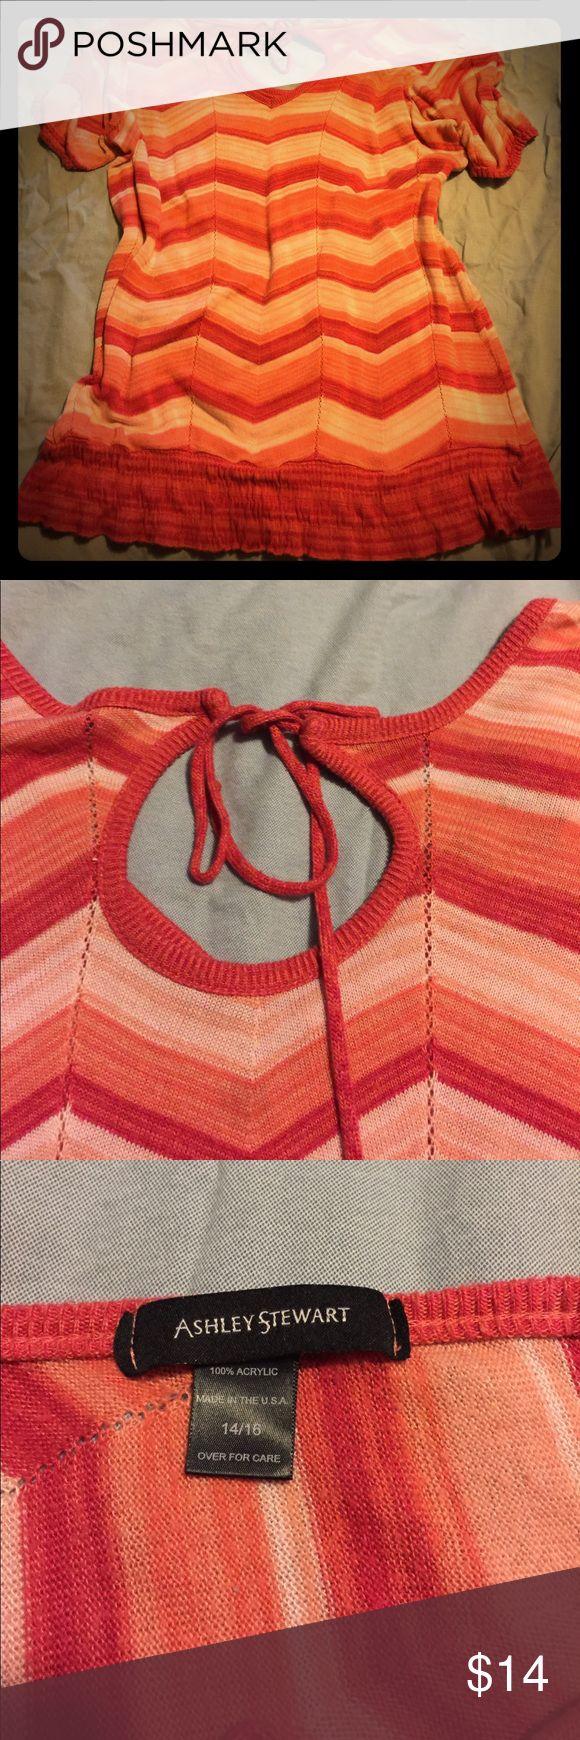 Ashley Stewart size 14/16 short sleeve sweater Adorable Ashley Stewart in beautiful colors. Minimal wear in good shape. Smoke free. Ashley Stewart Tops Sweatshirts & Hoodies